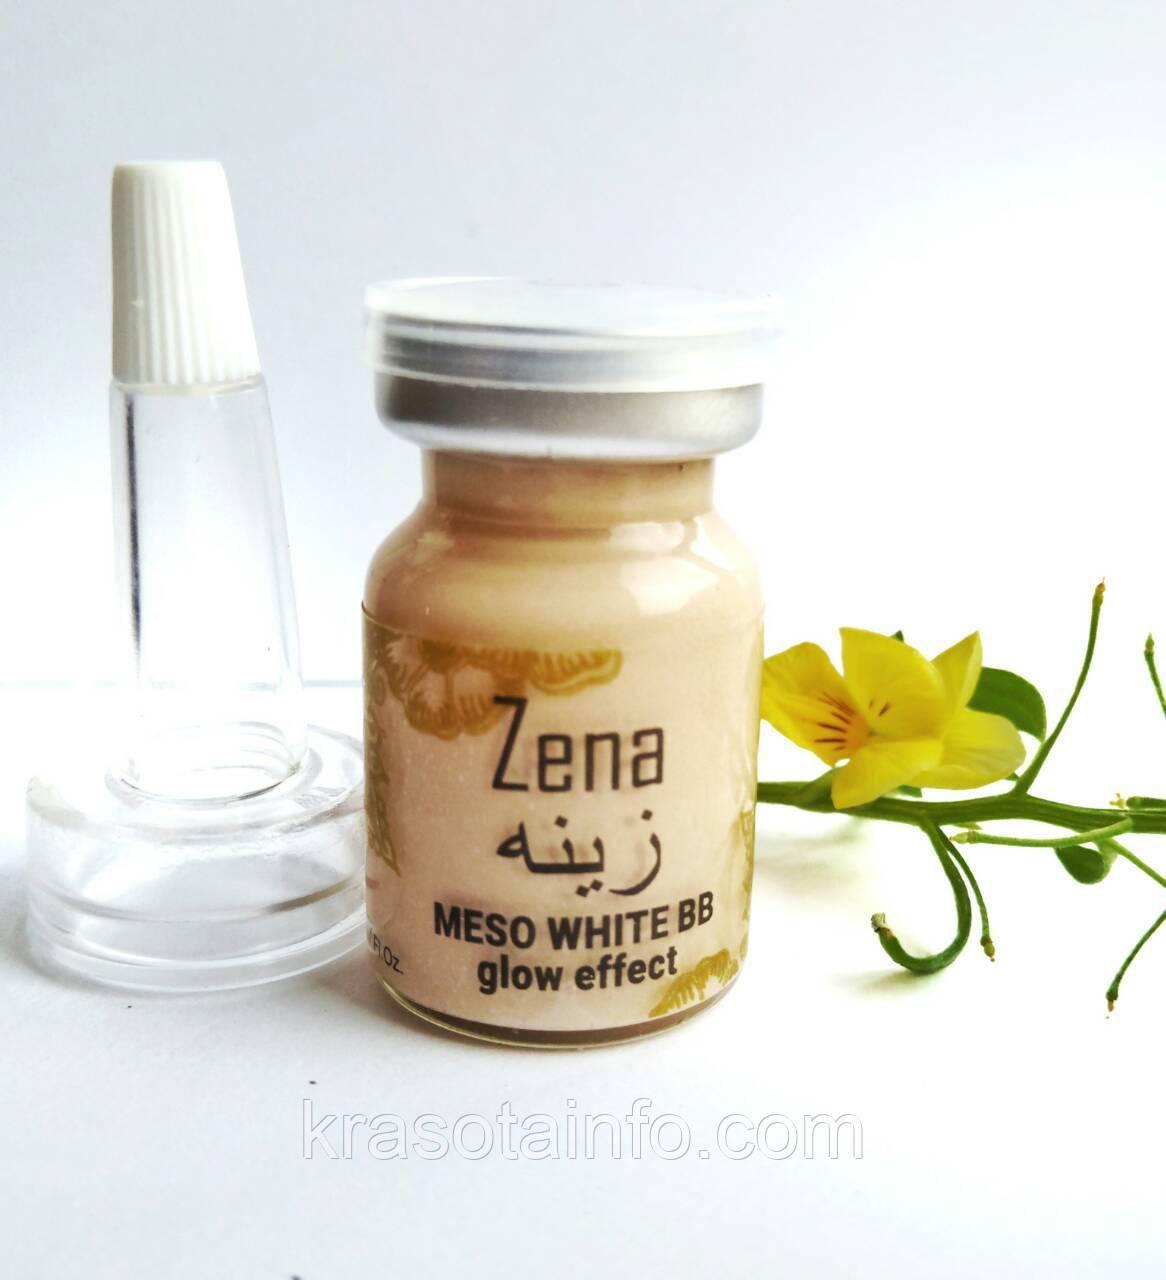 BB glow treatment ББ мезо для процедуры бб глоу тритмент BB meso white skin Zena, 5 мл